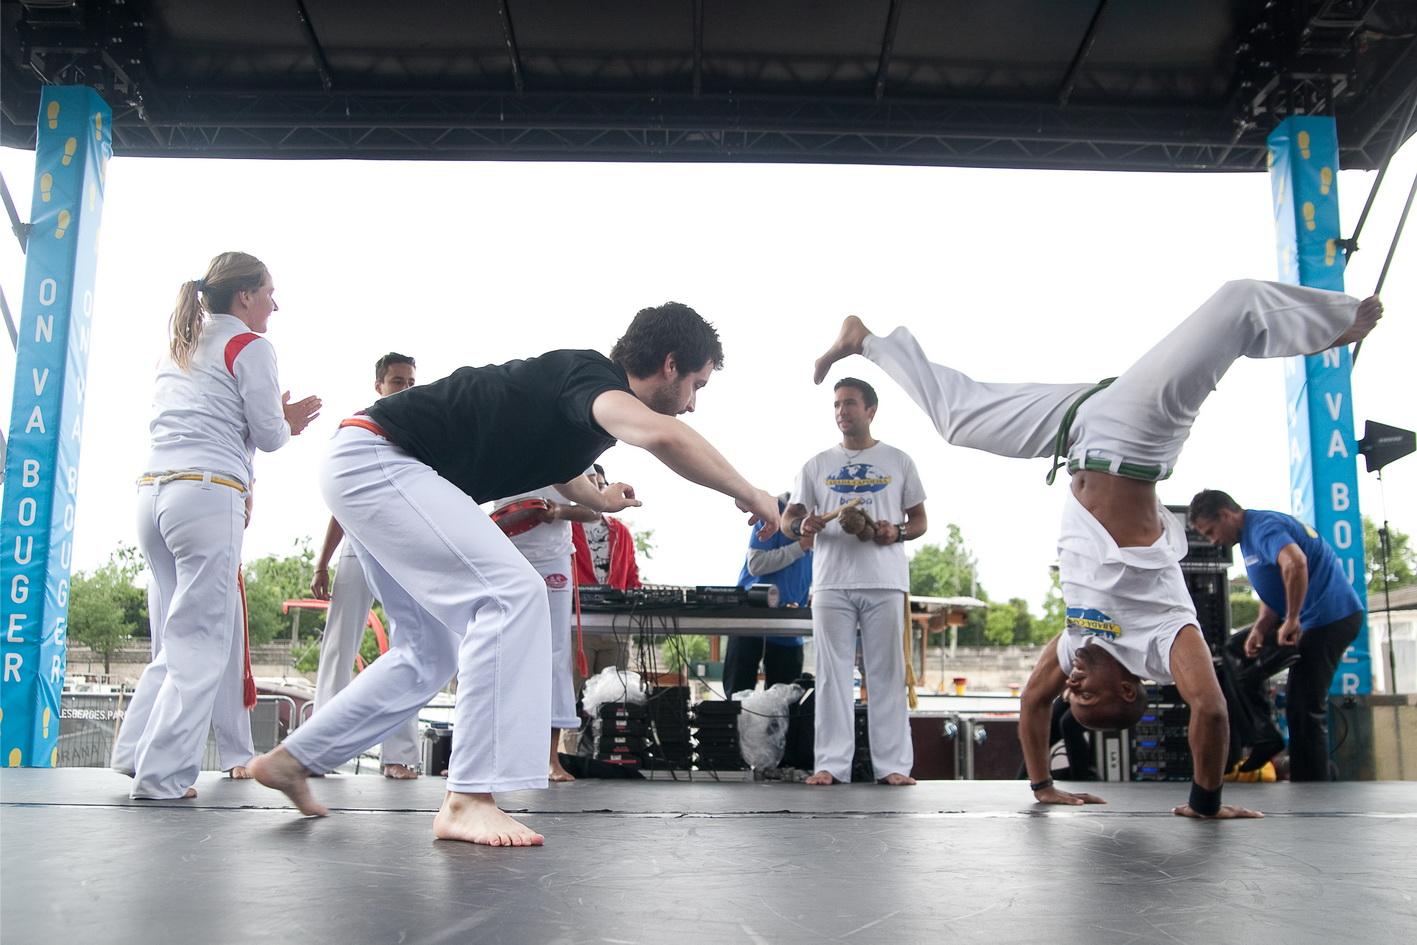 capoeira-paris-berges-de-seine-2014